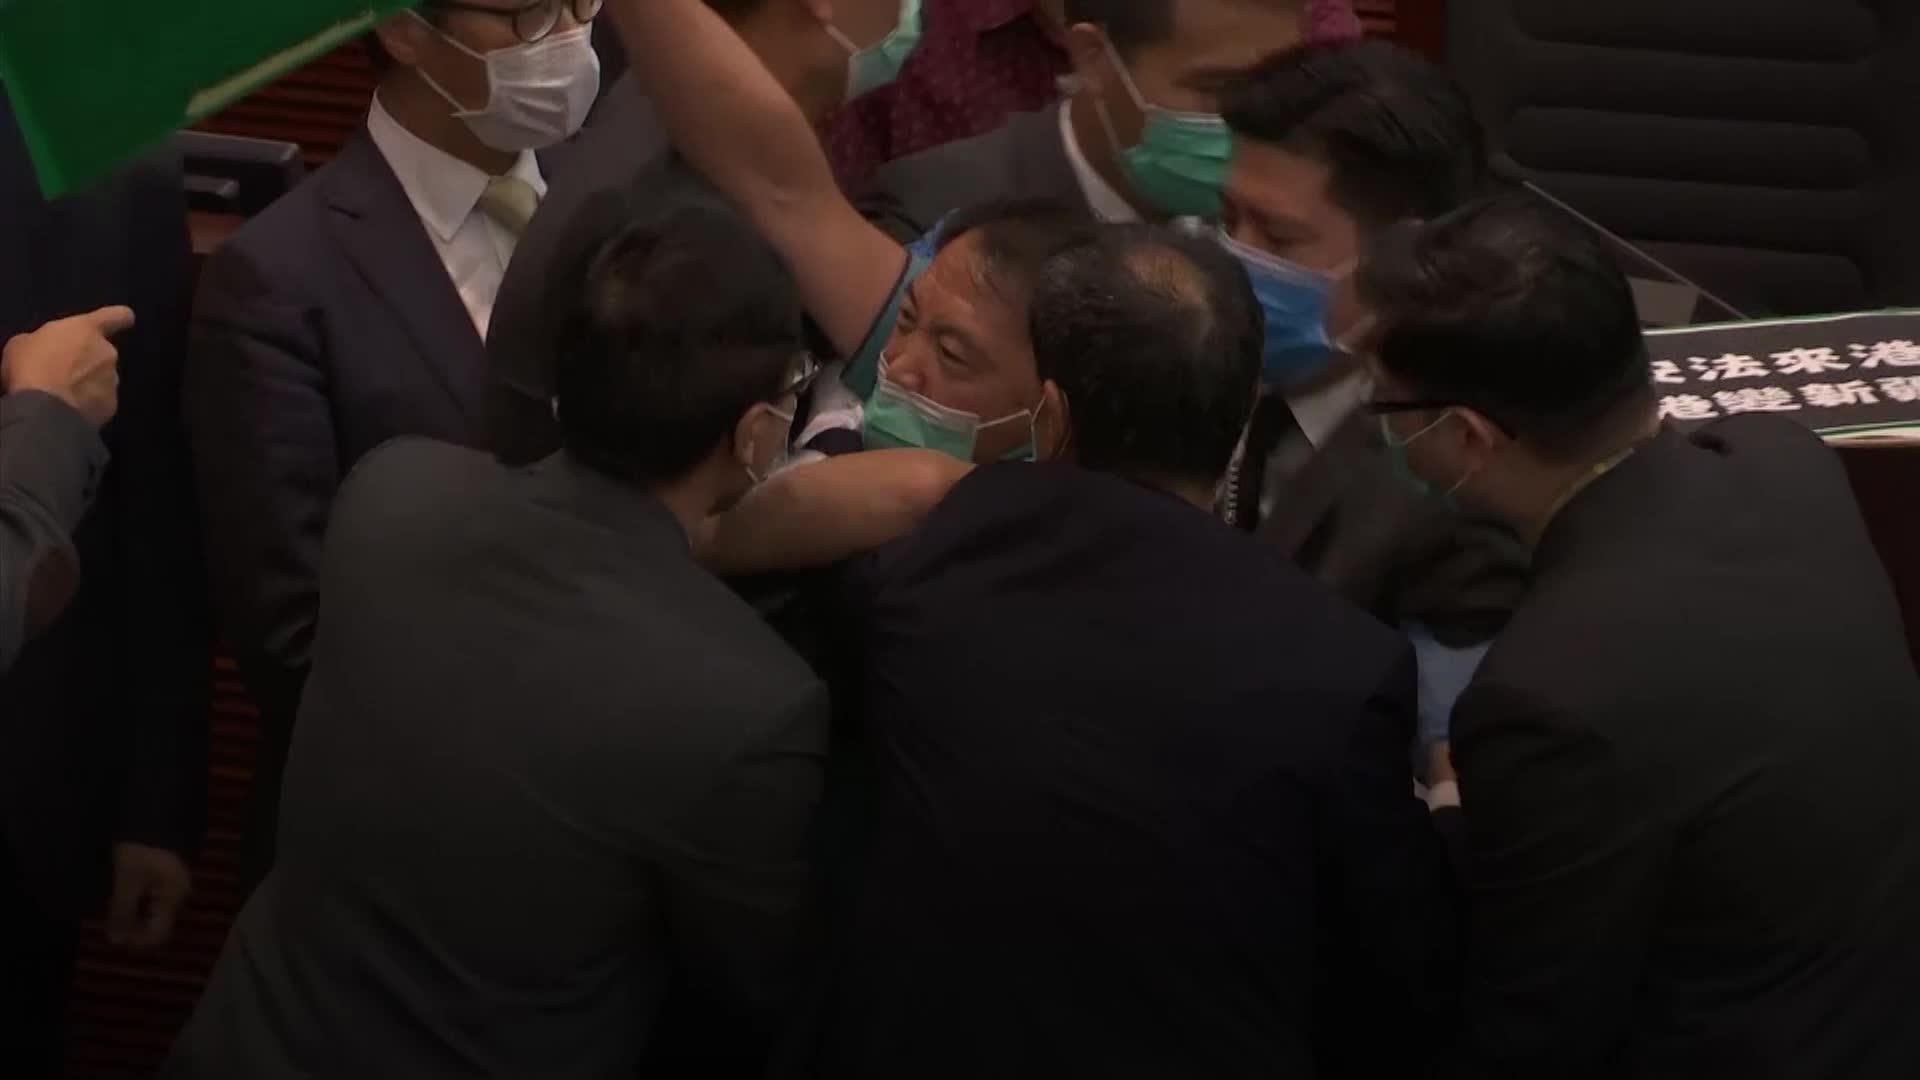 Scuffles break out between Hong Kong legislators over security freedoms